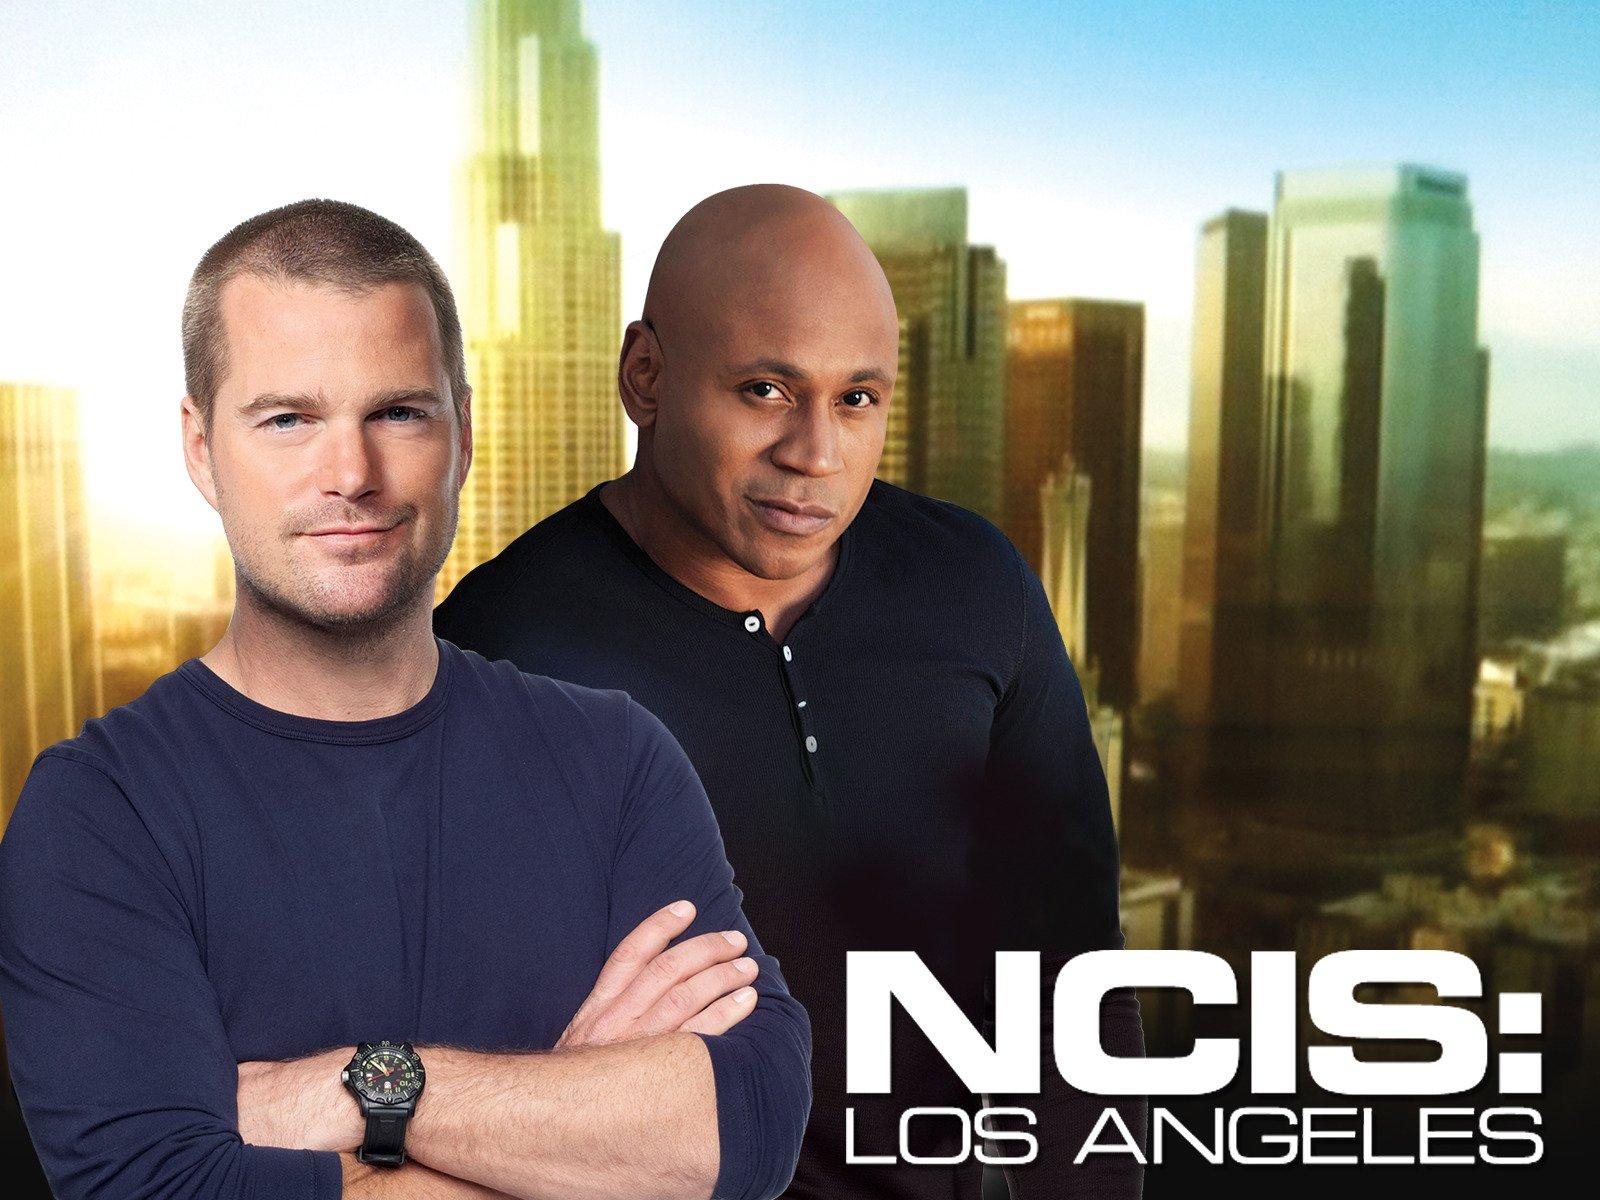 ncis los angeles season 5 episode 18 123movies